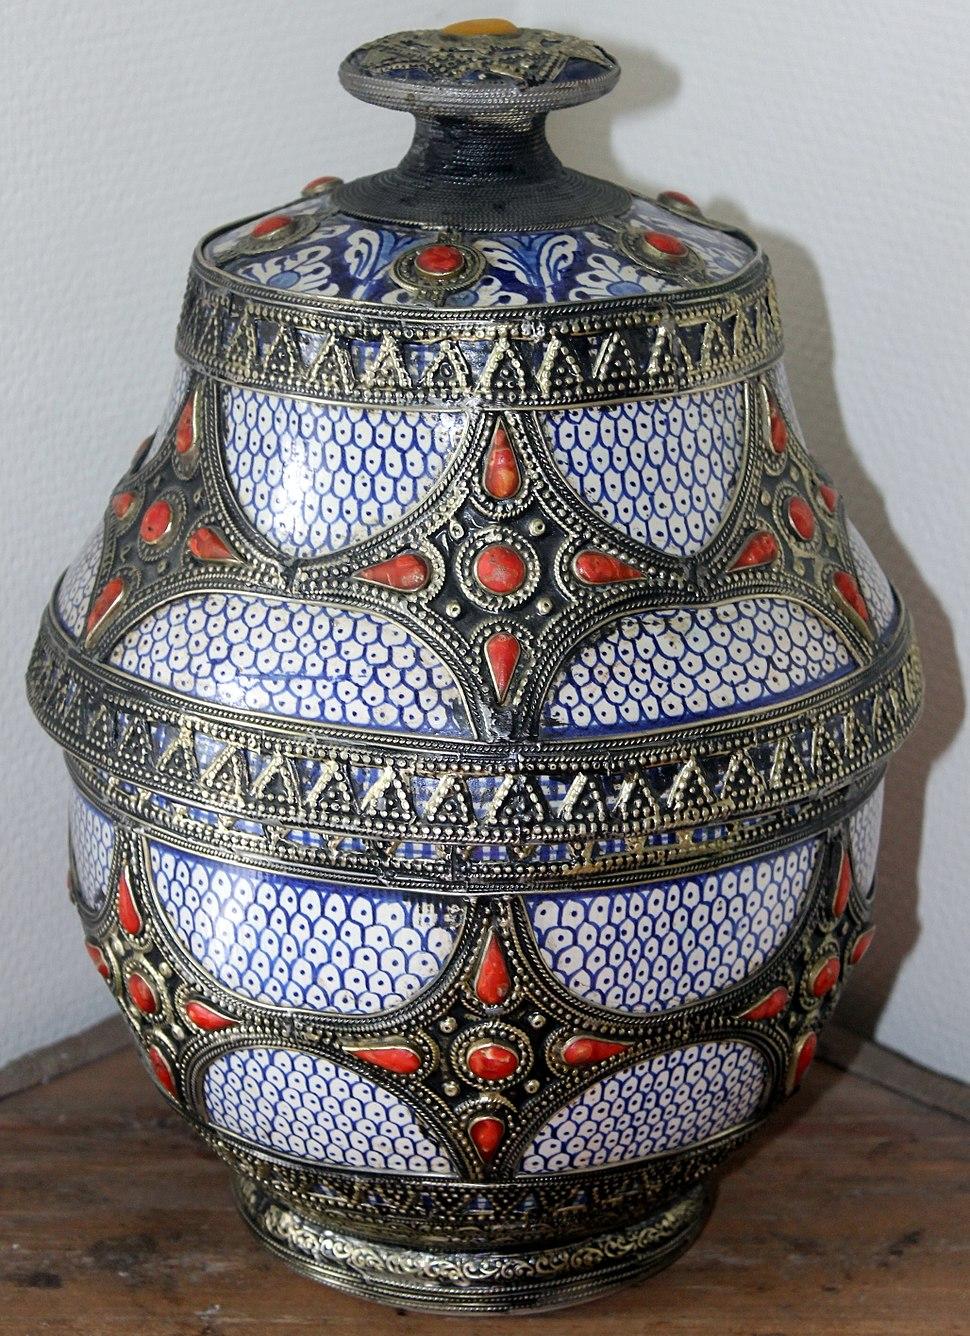 Morocco, Safi ceramic vessel Jobbana